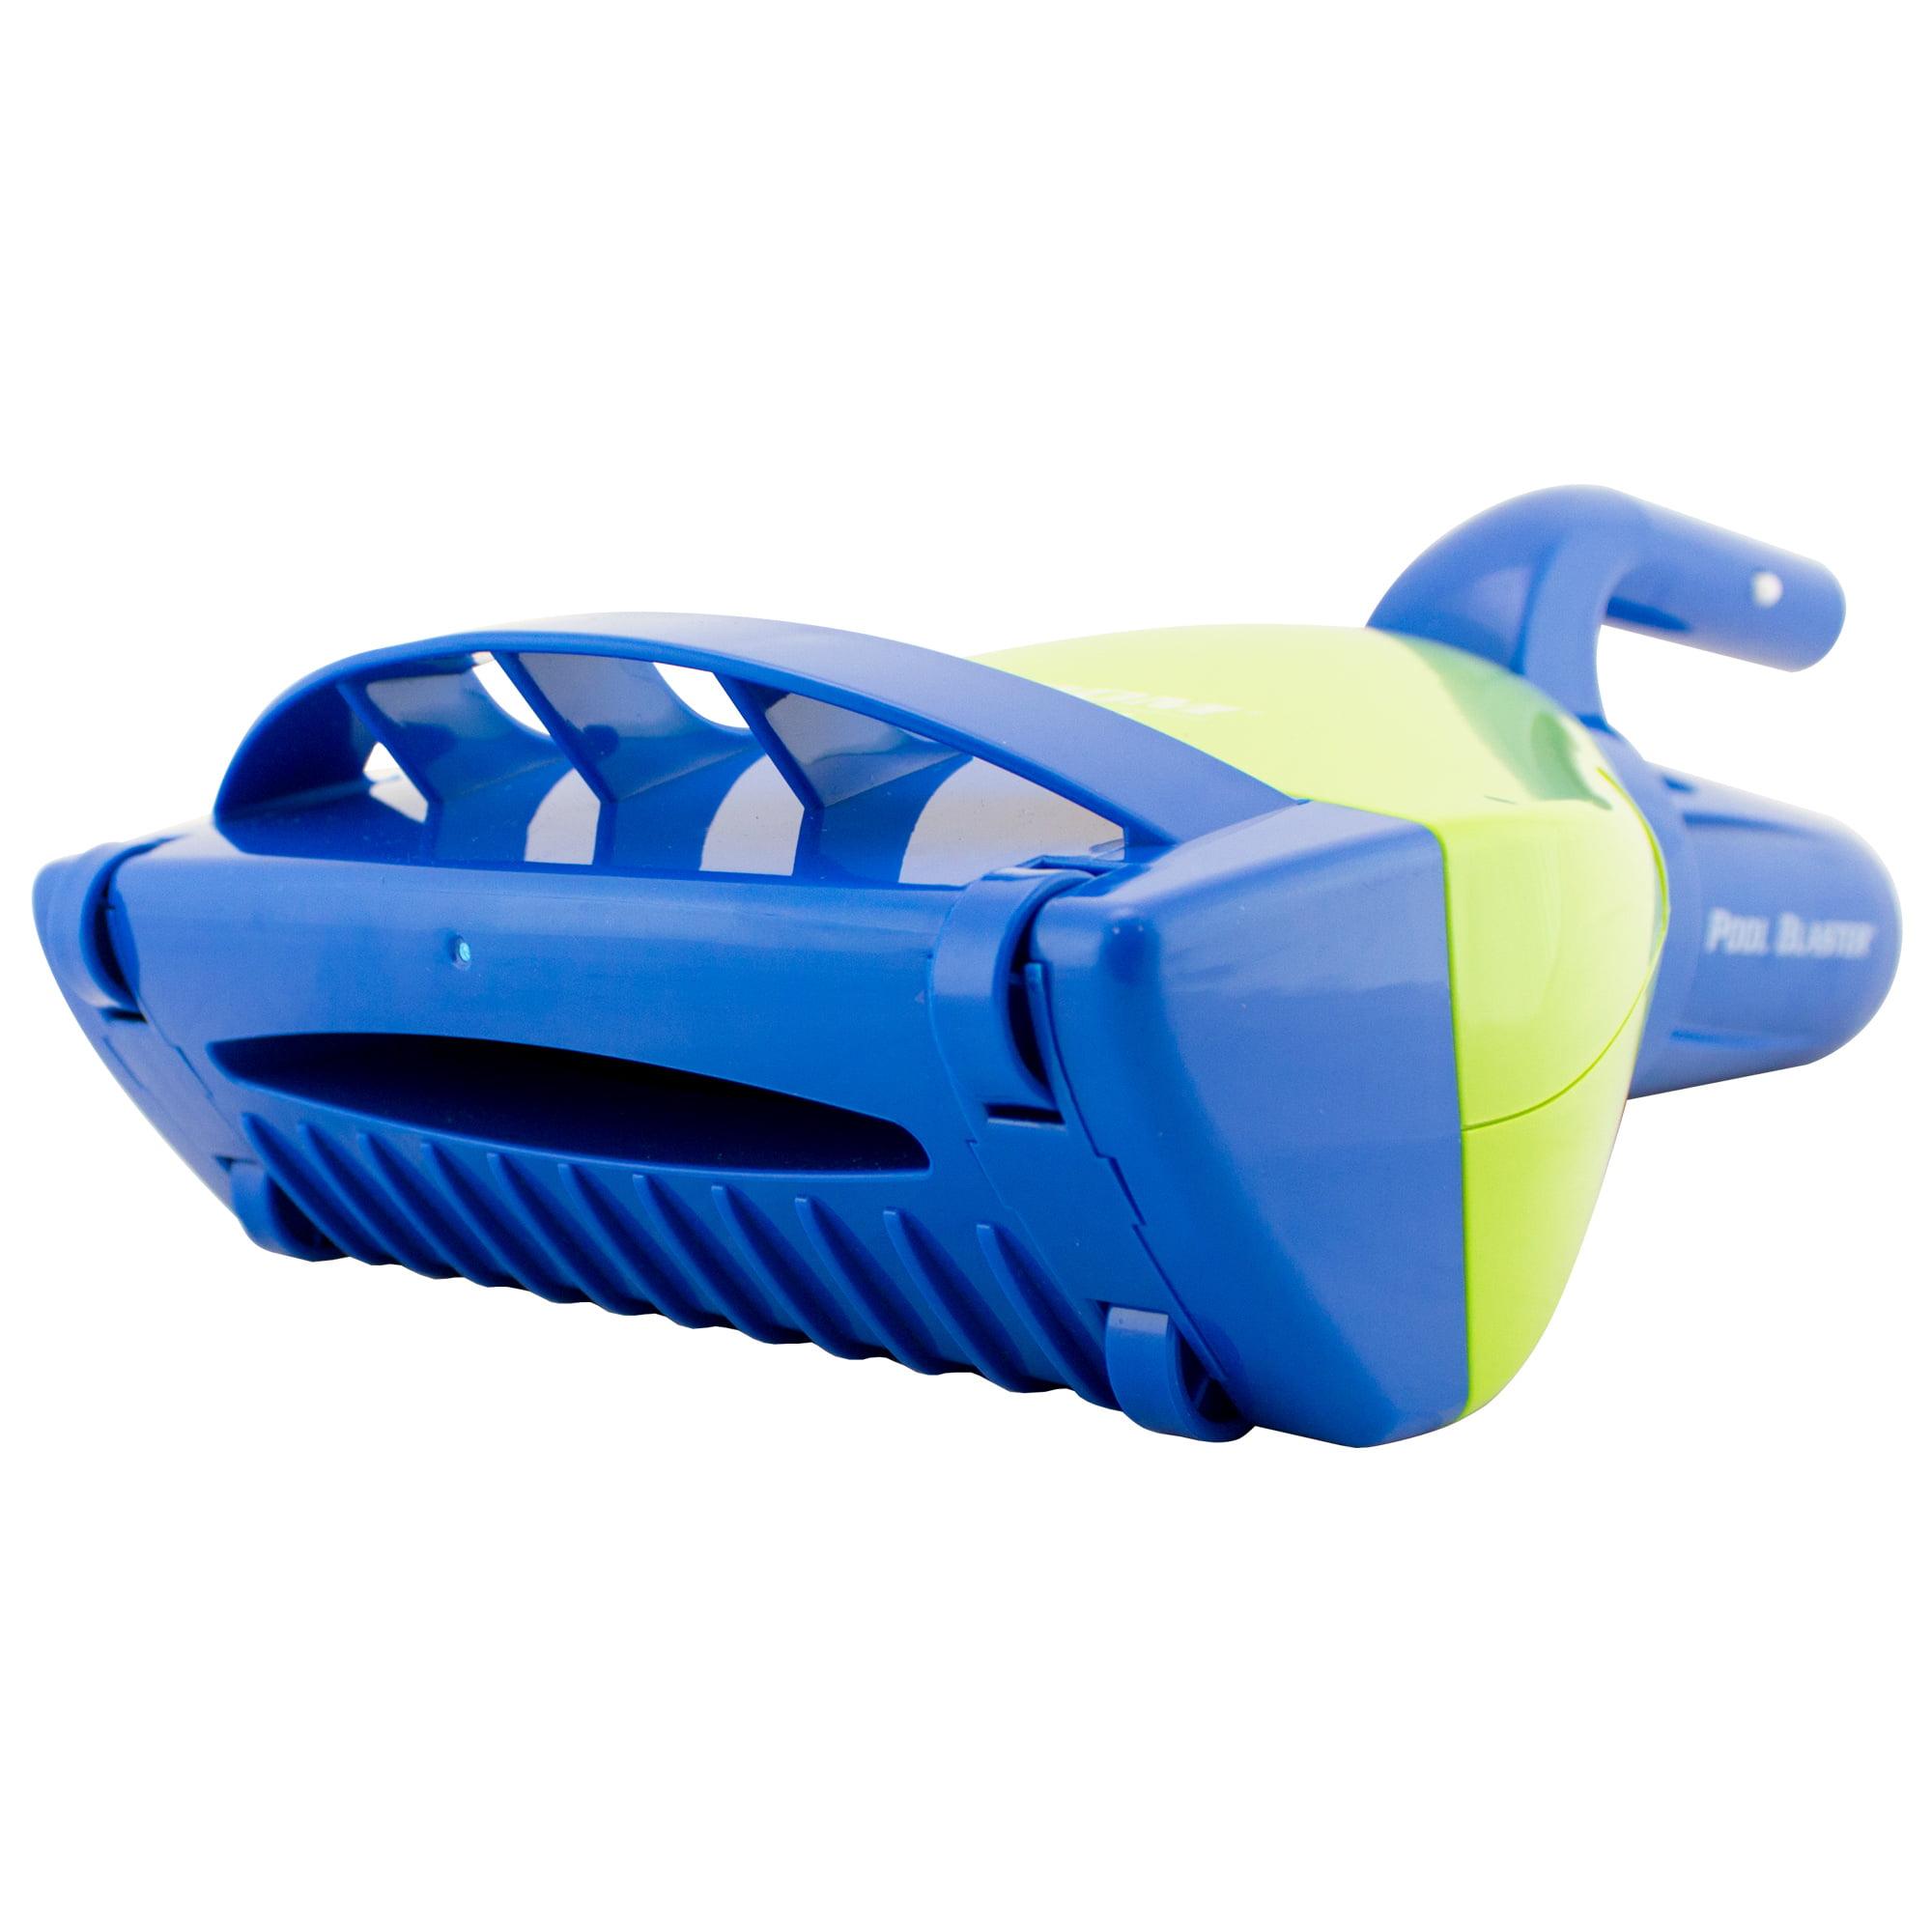 Water Tech Pool Blaster Aqua Broom Sweep Xl Walmart Com Walmart Com